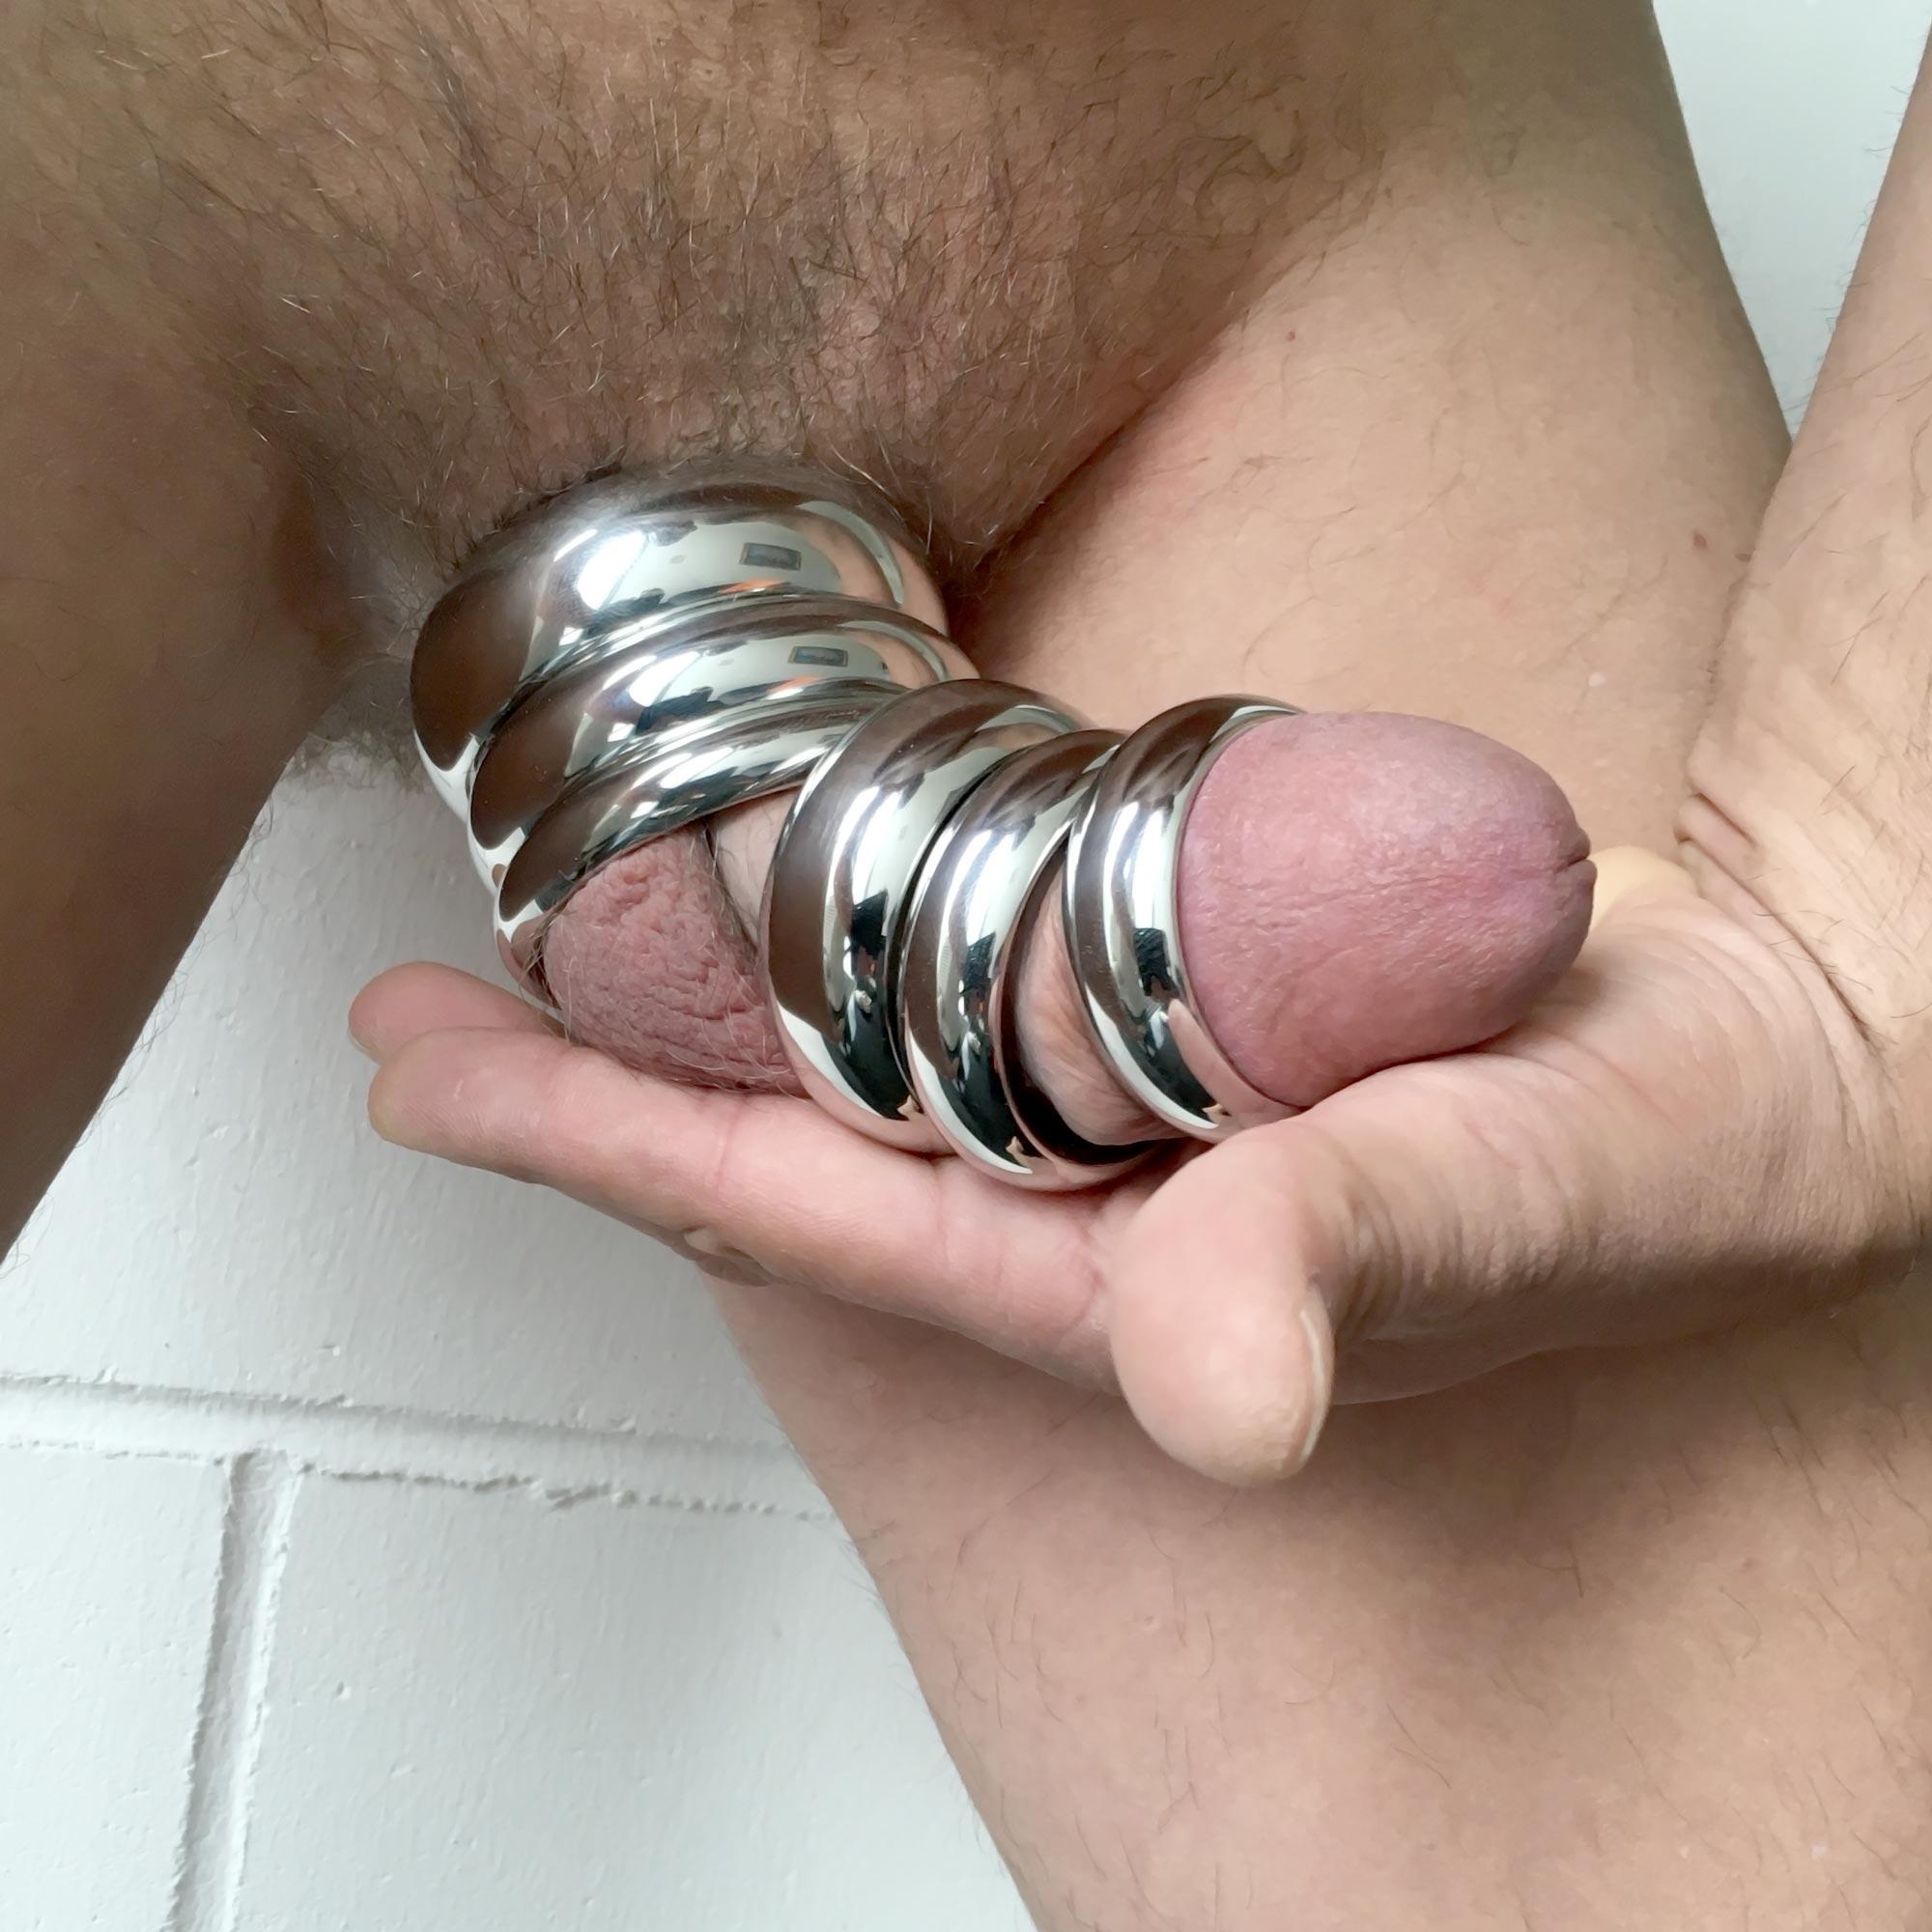 Фильм кольца на член